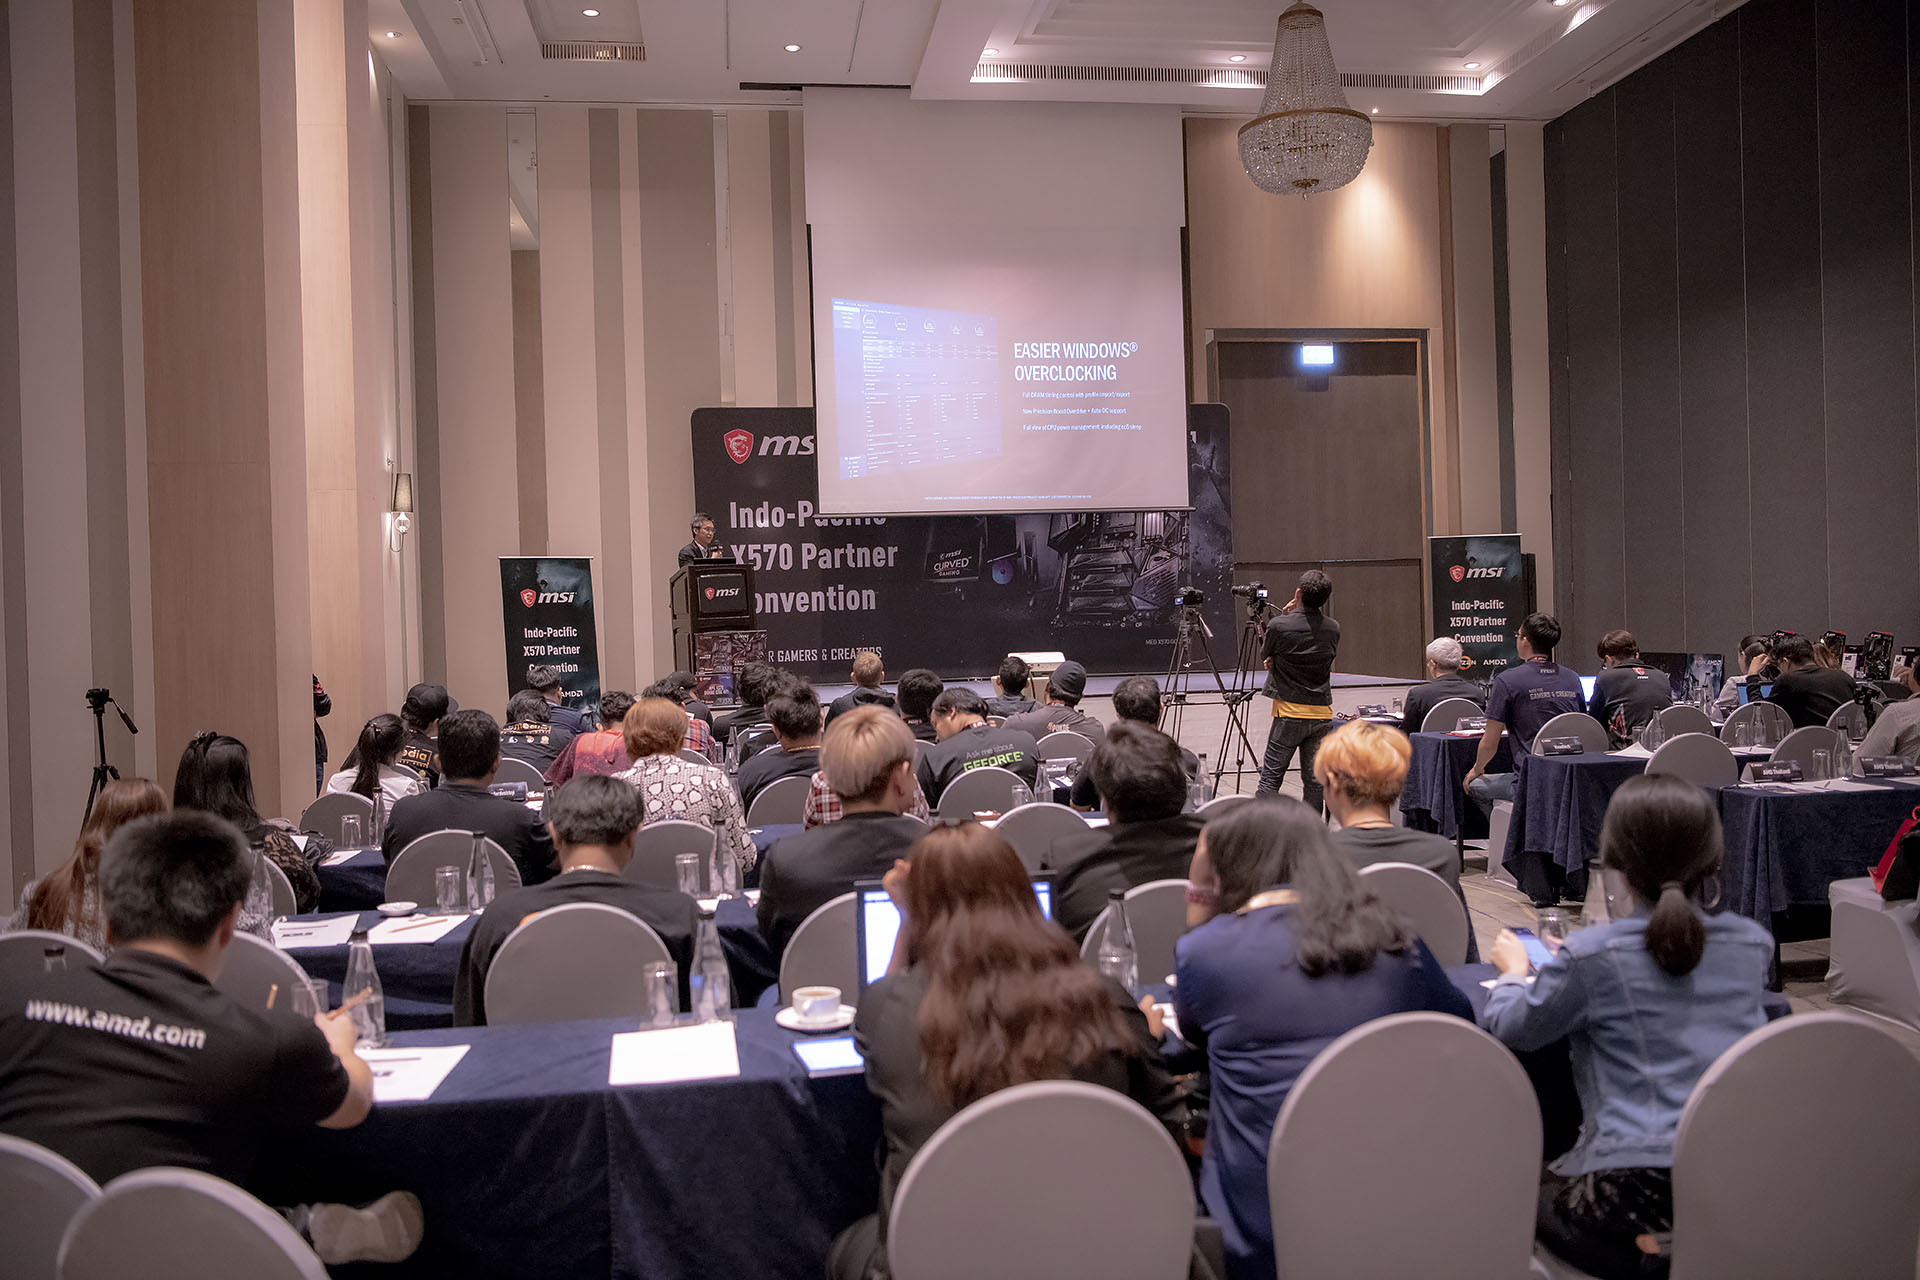 dsc 4926 บรรยากาศงาน MSI Indo Pacific X570 Partner Convention พบการเปิดตัวเมนบอร์ด X570 รุ่นใหม่ล่าสุดจากทาง MSI ต้อนรับการมาของซีพียู AMD RYZEN 3000ซีรี่ย์